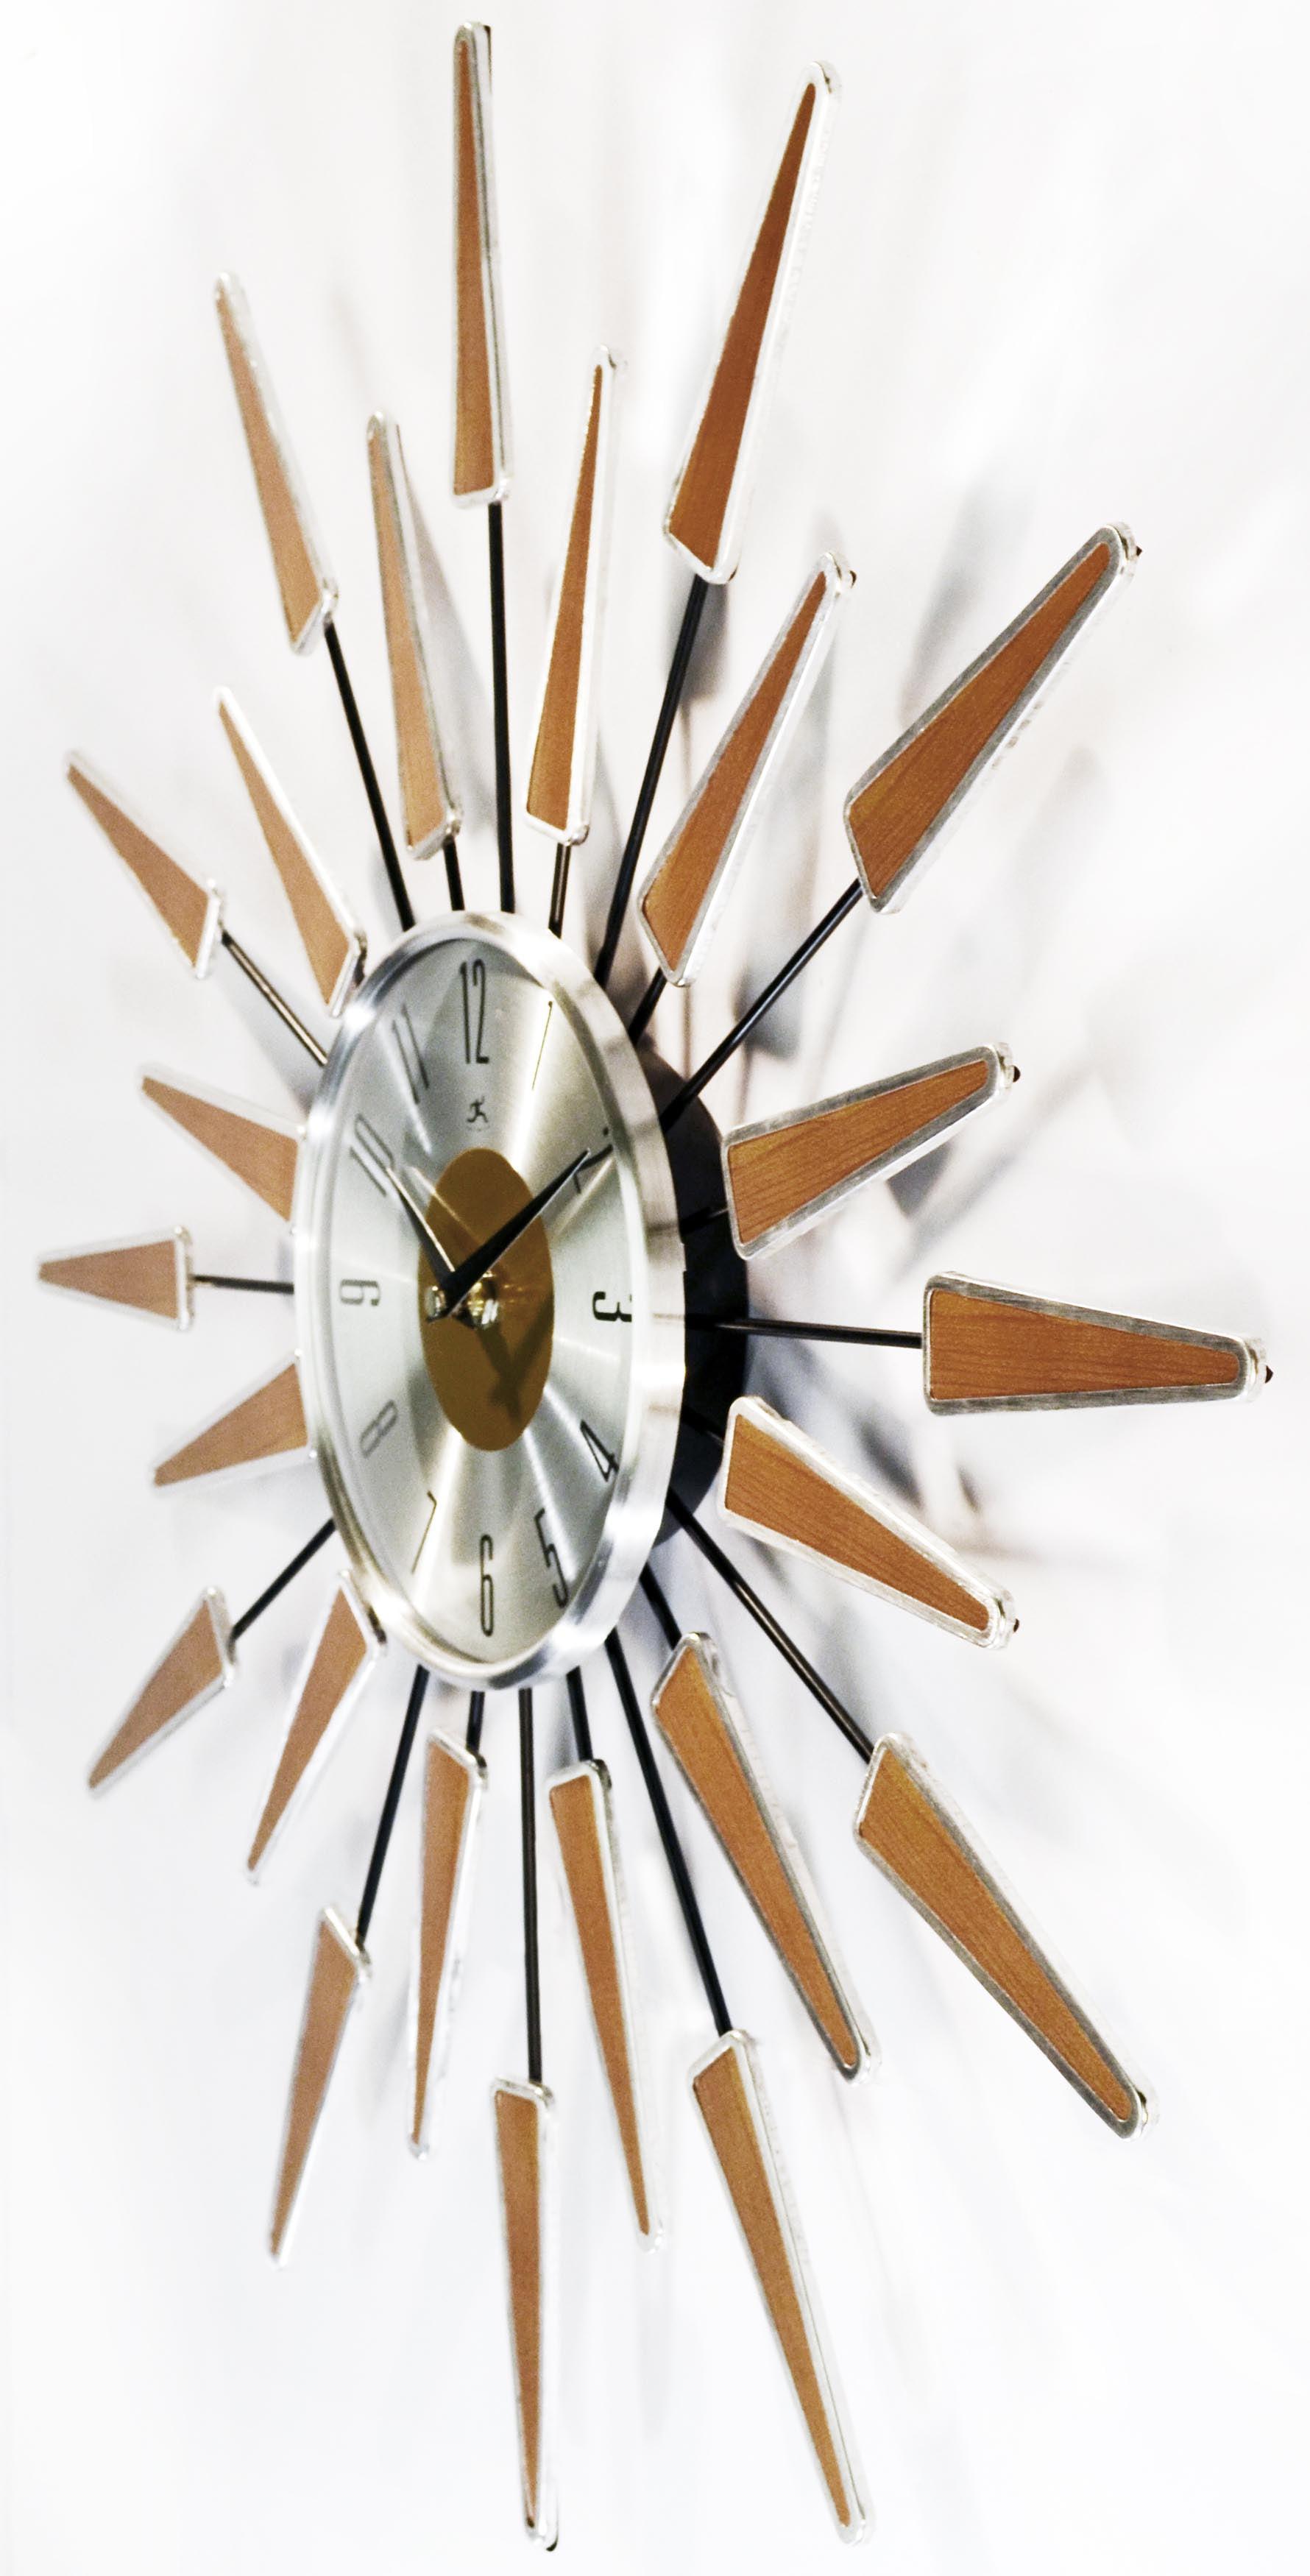 Image of: Sunburst Clock Mid Century Modern Wall Decor Vintage Starburst Retro Metal Art Wall Clocks